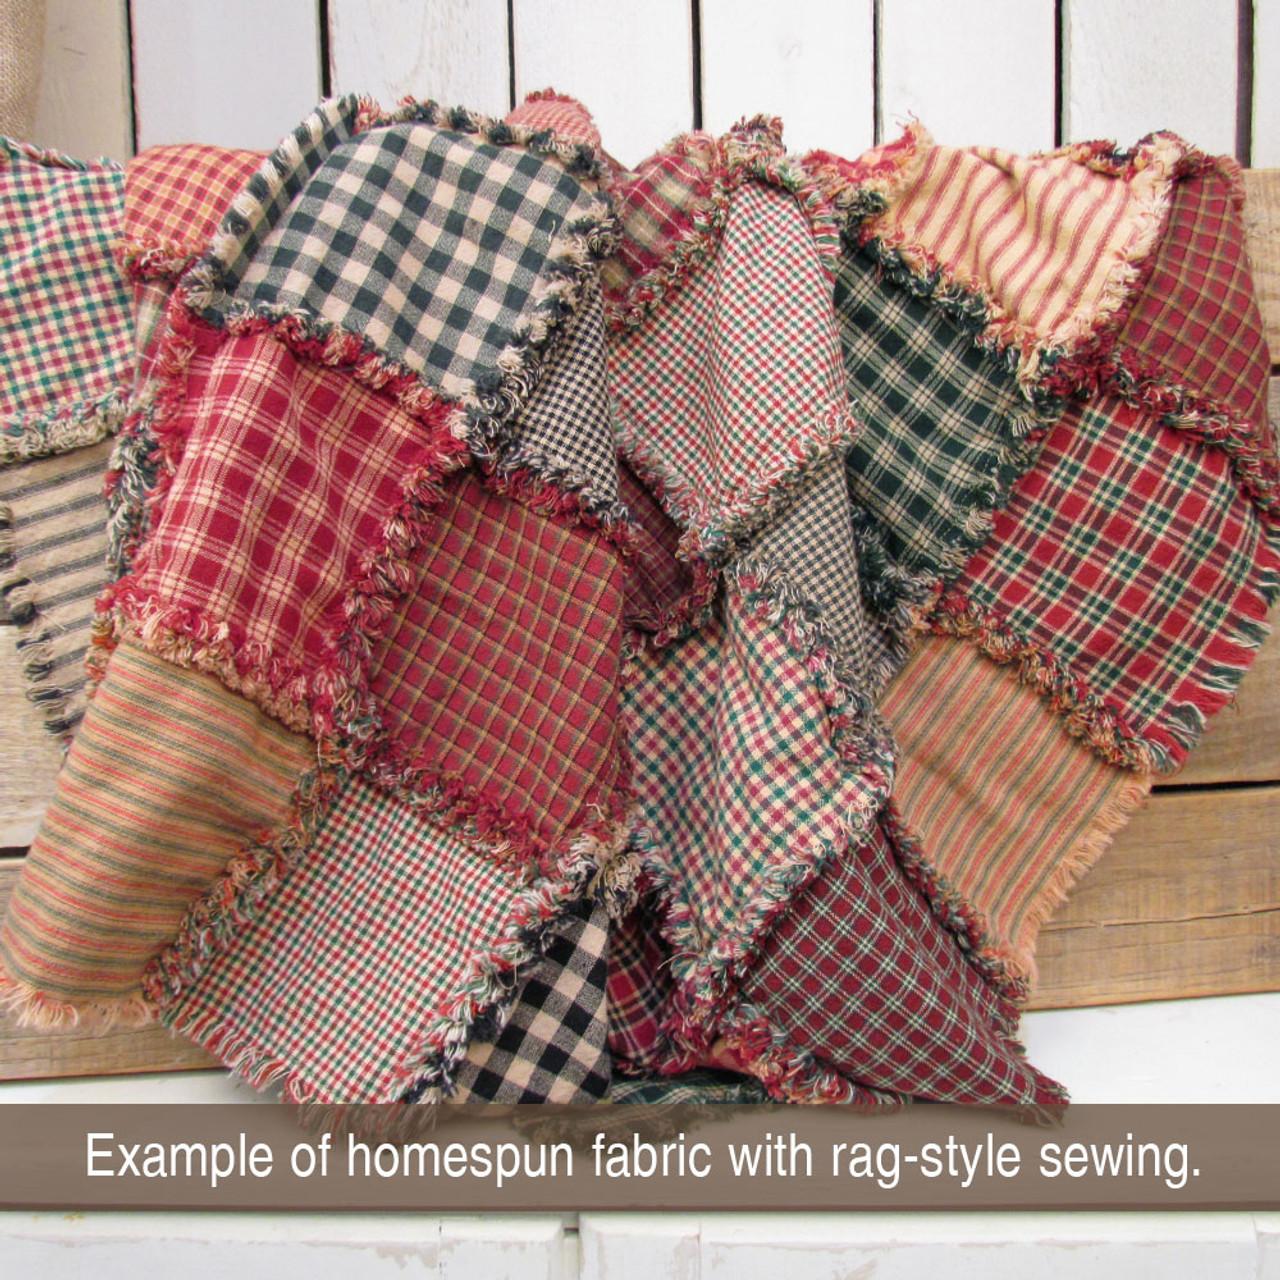 Farmhouse Red & Green Homespun Cotton Fabric